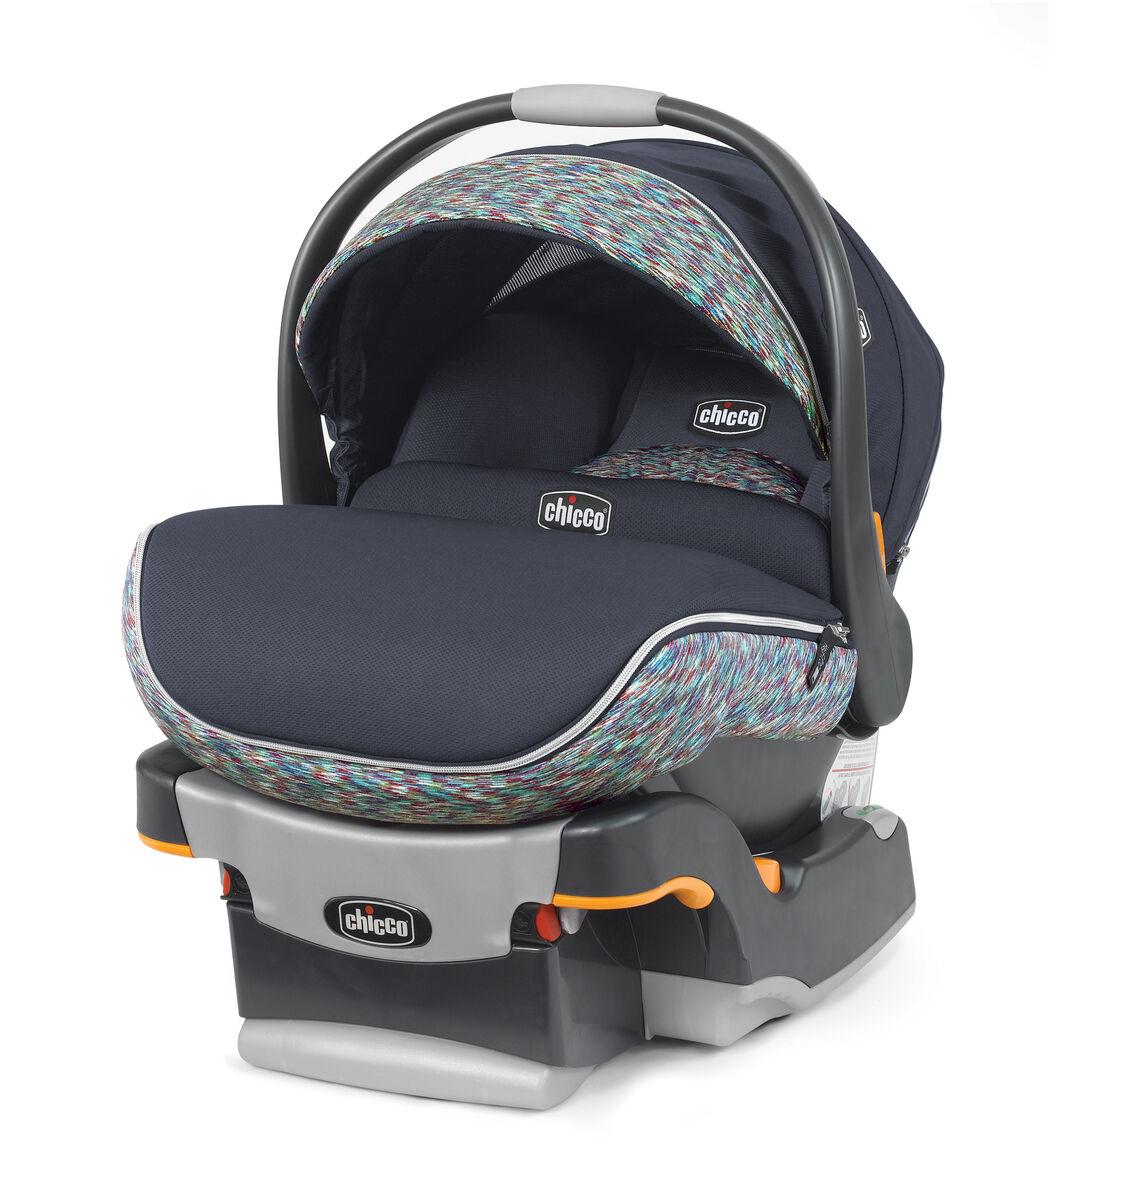 Keyfit 30 zip infant car seat base privatakeyfit 30 zip infant car seat base privata